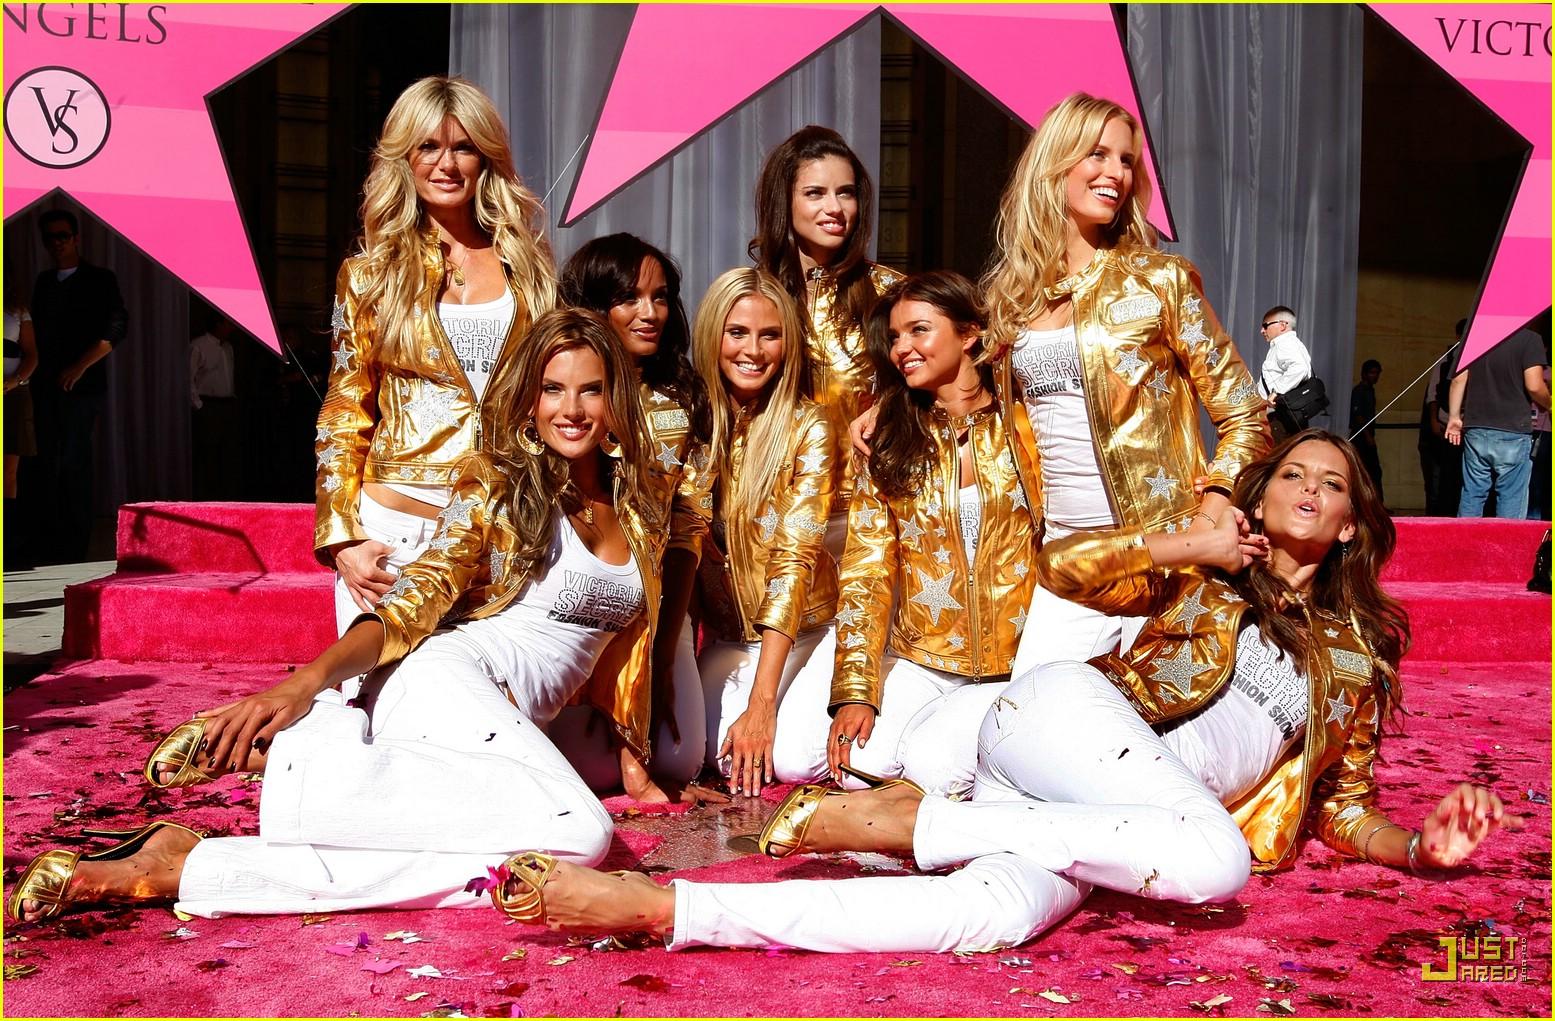 heidi klum victorias secret fashion show 2007 10735501